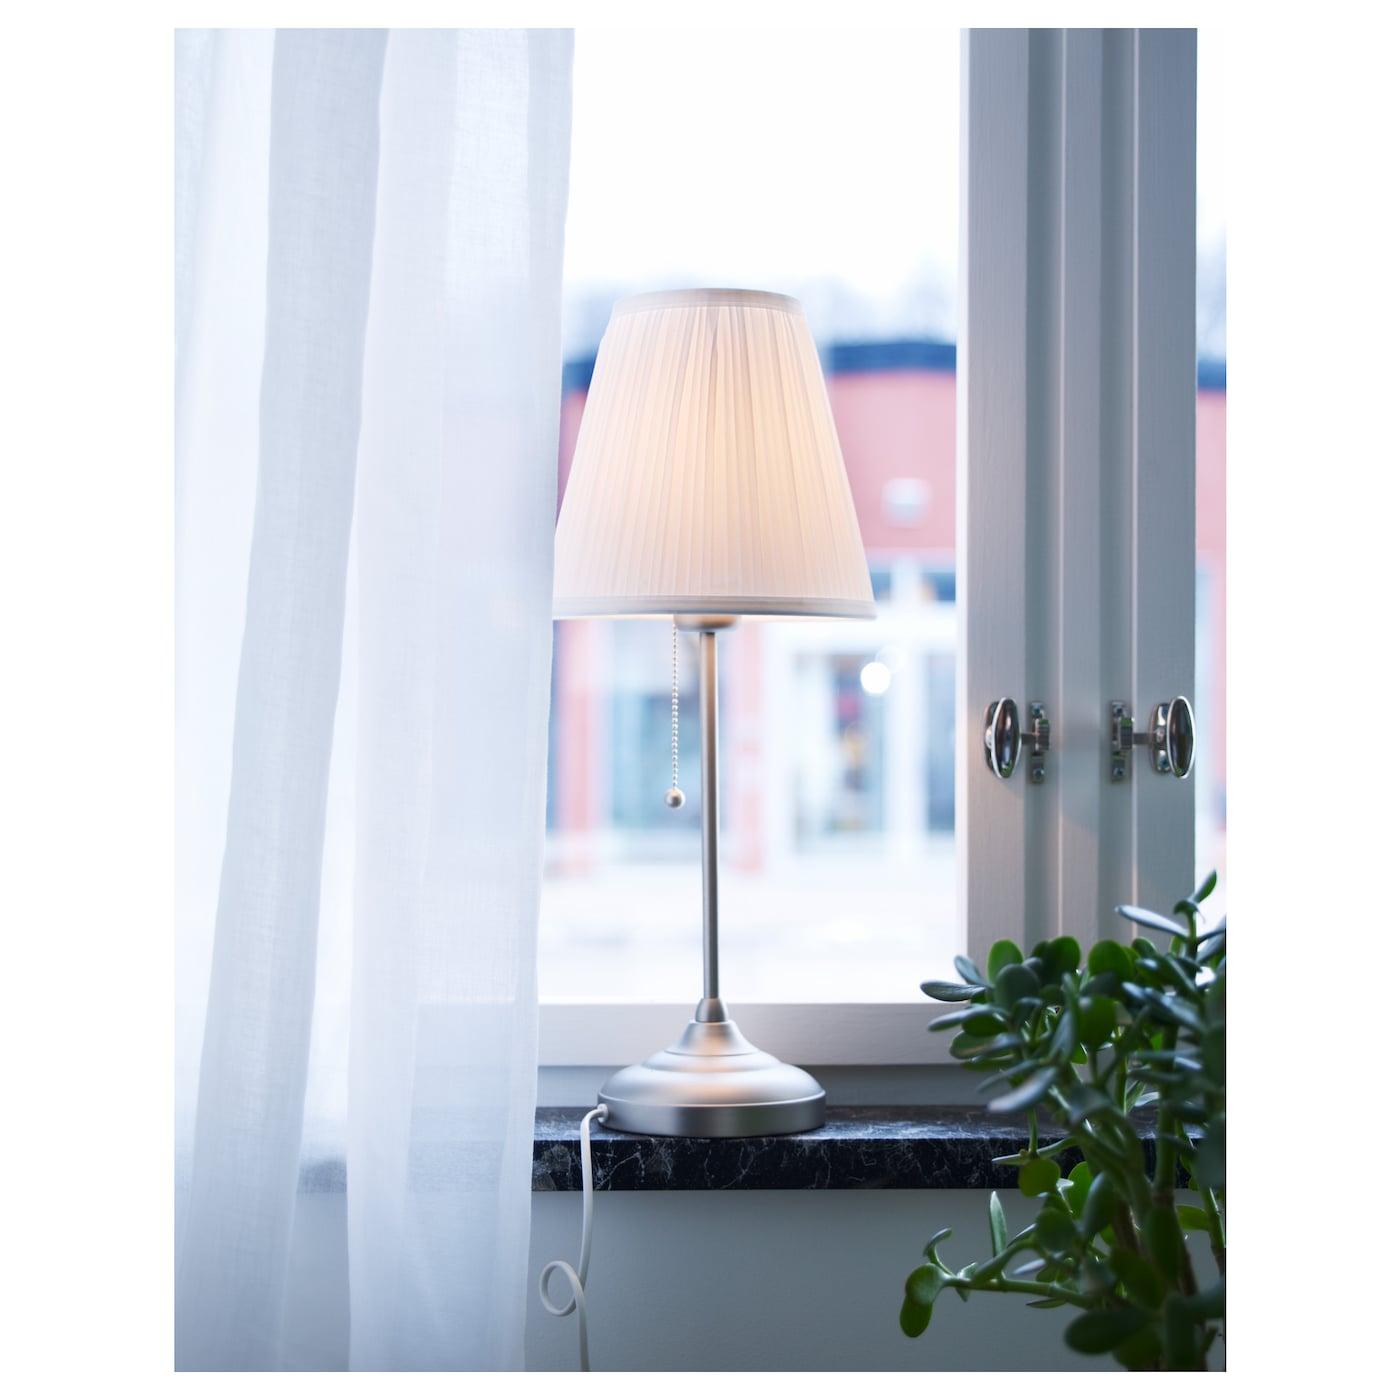 rstid lampe de table nickel blanc ikea. Black Bedroom Furniture Sets. Home Design Ideas